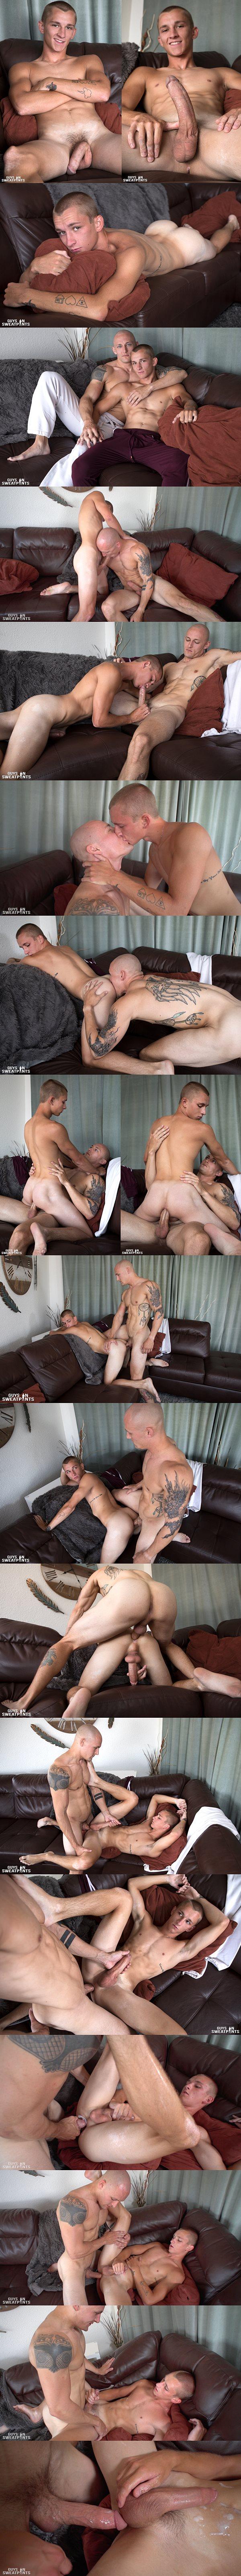 Chiseled muscle stud Trevor Laster barebacks and creampies cute hung newcomer Theo Brady at Guysinsweatpants 02